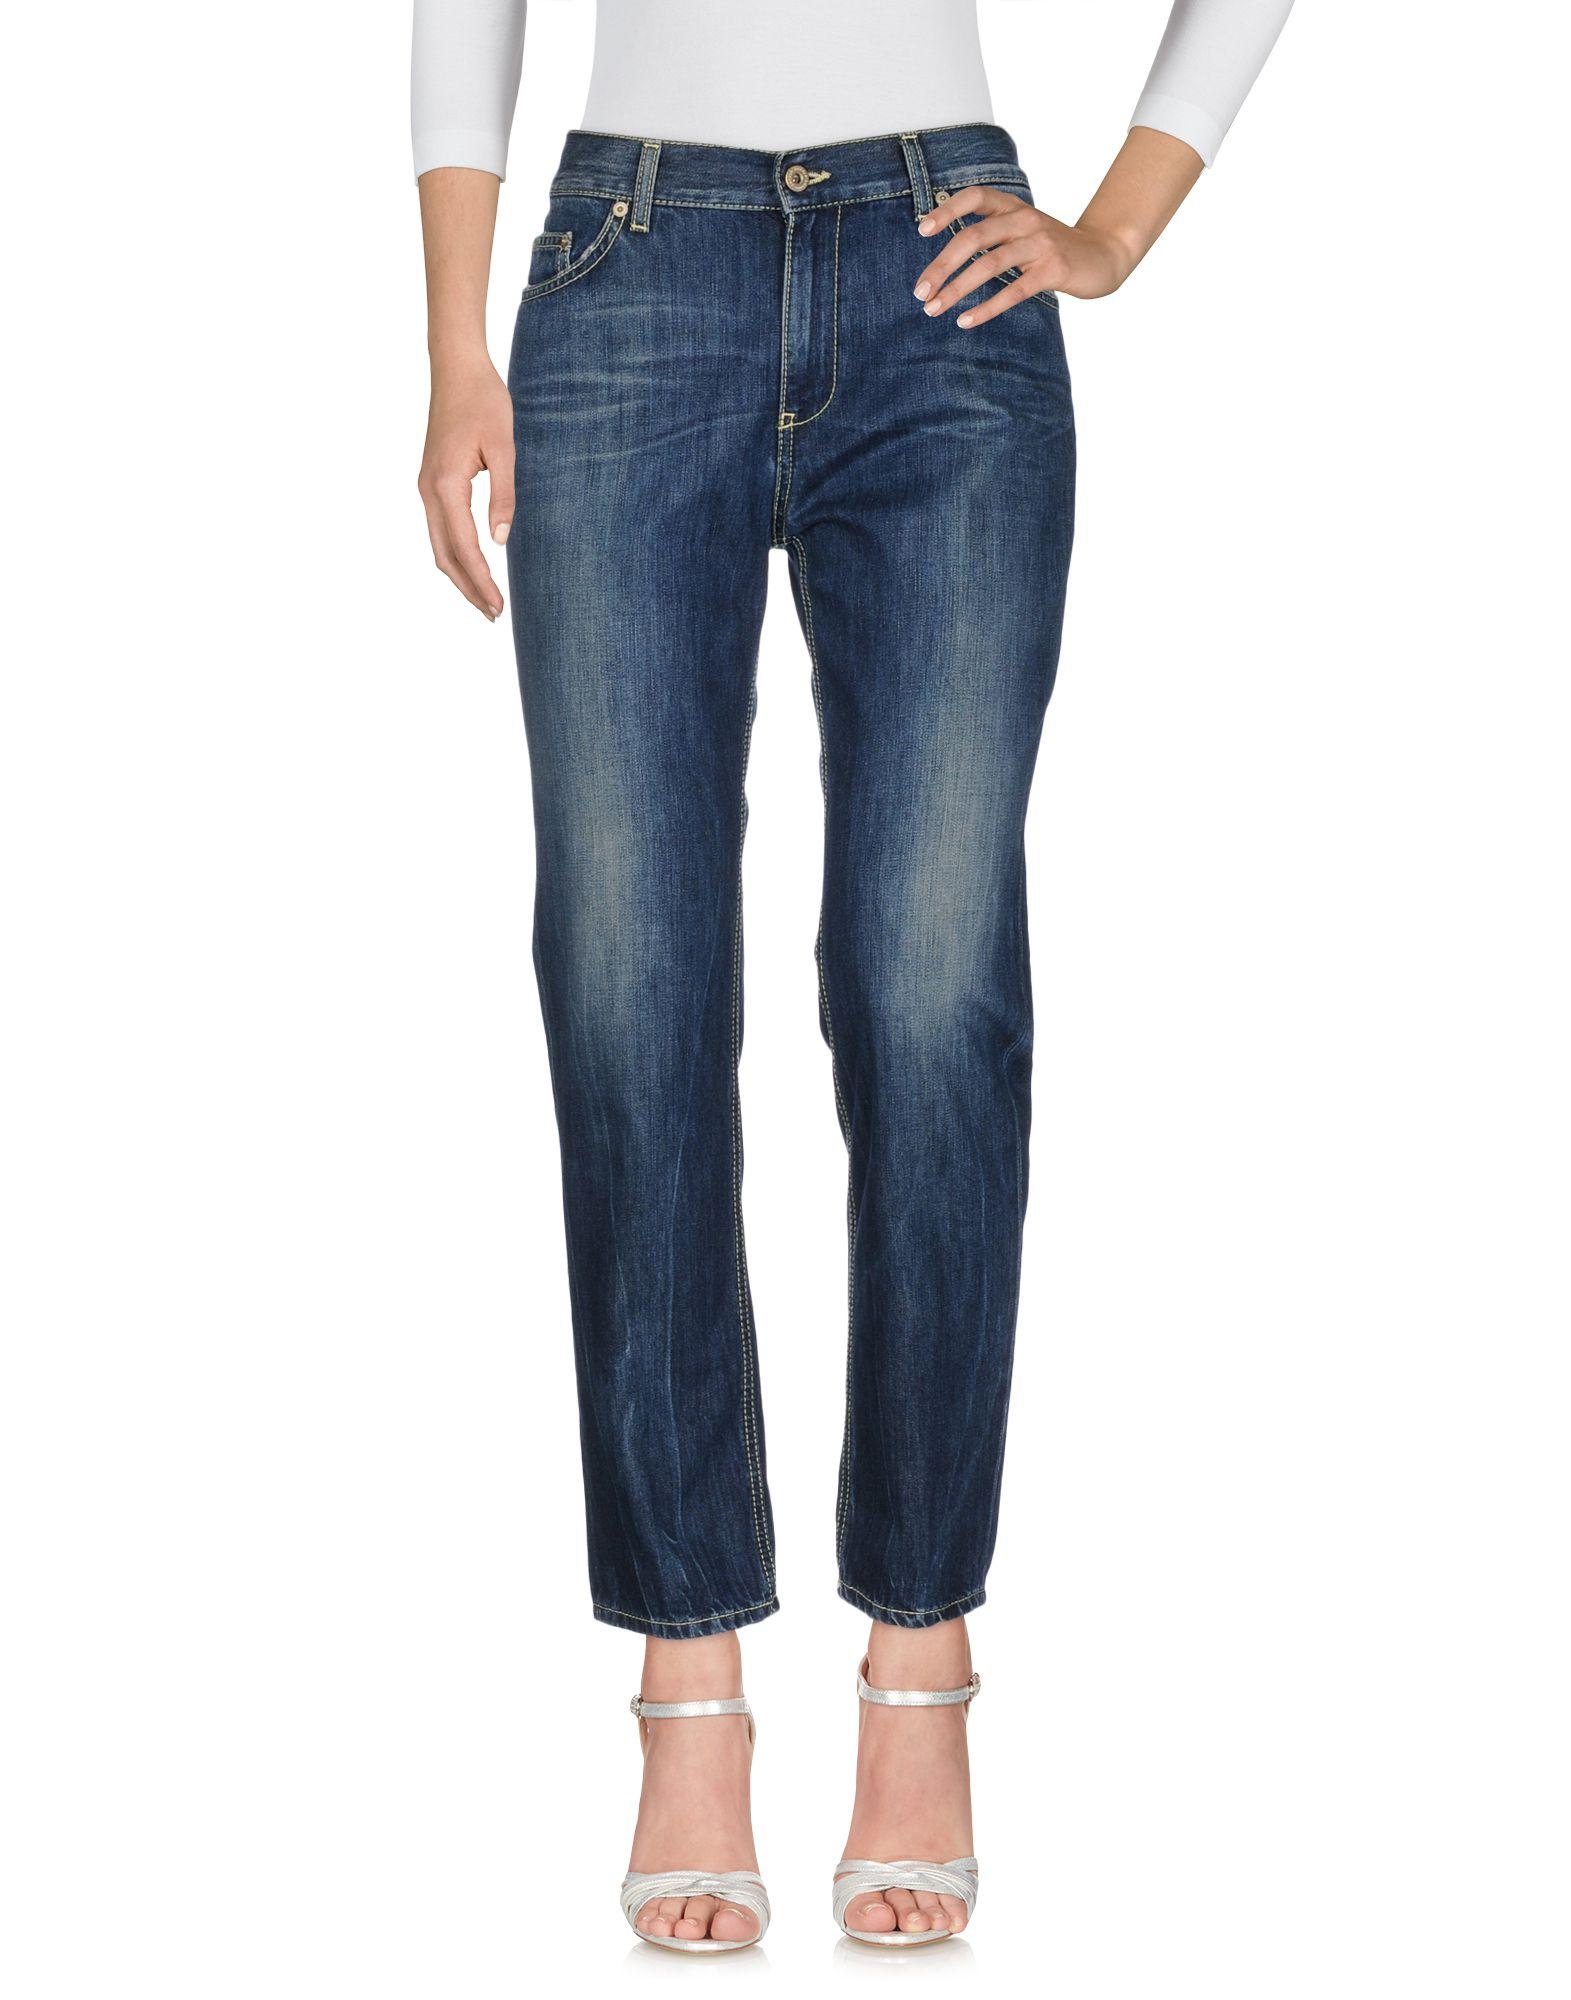 Pantaloni Jeans Dondup Donna - Acquista online su FJRksT